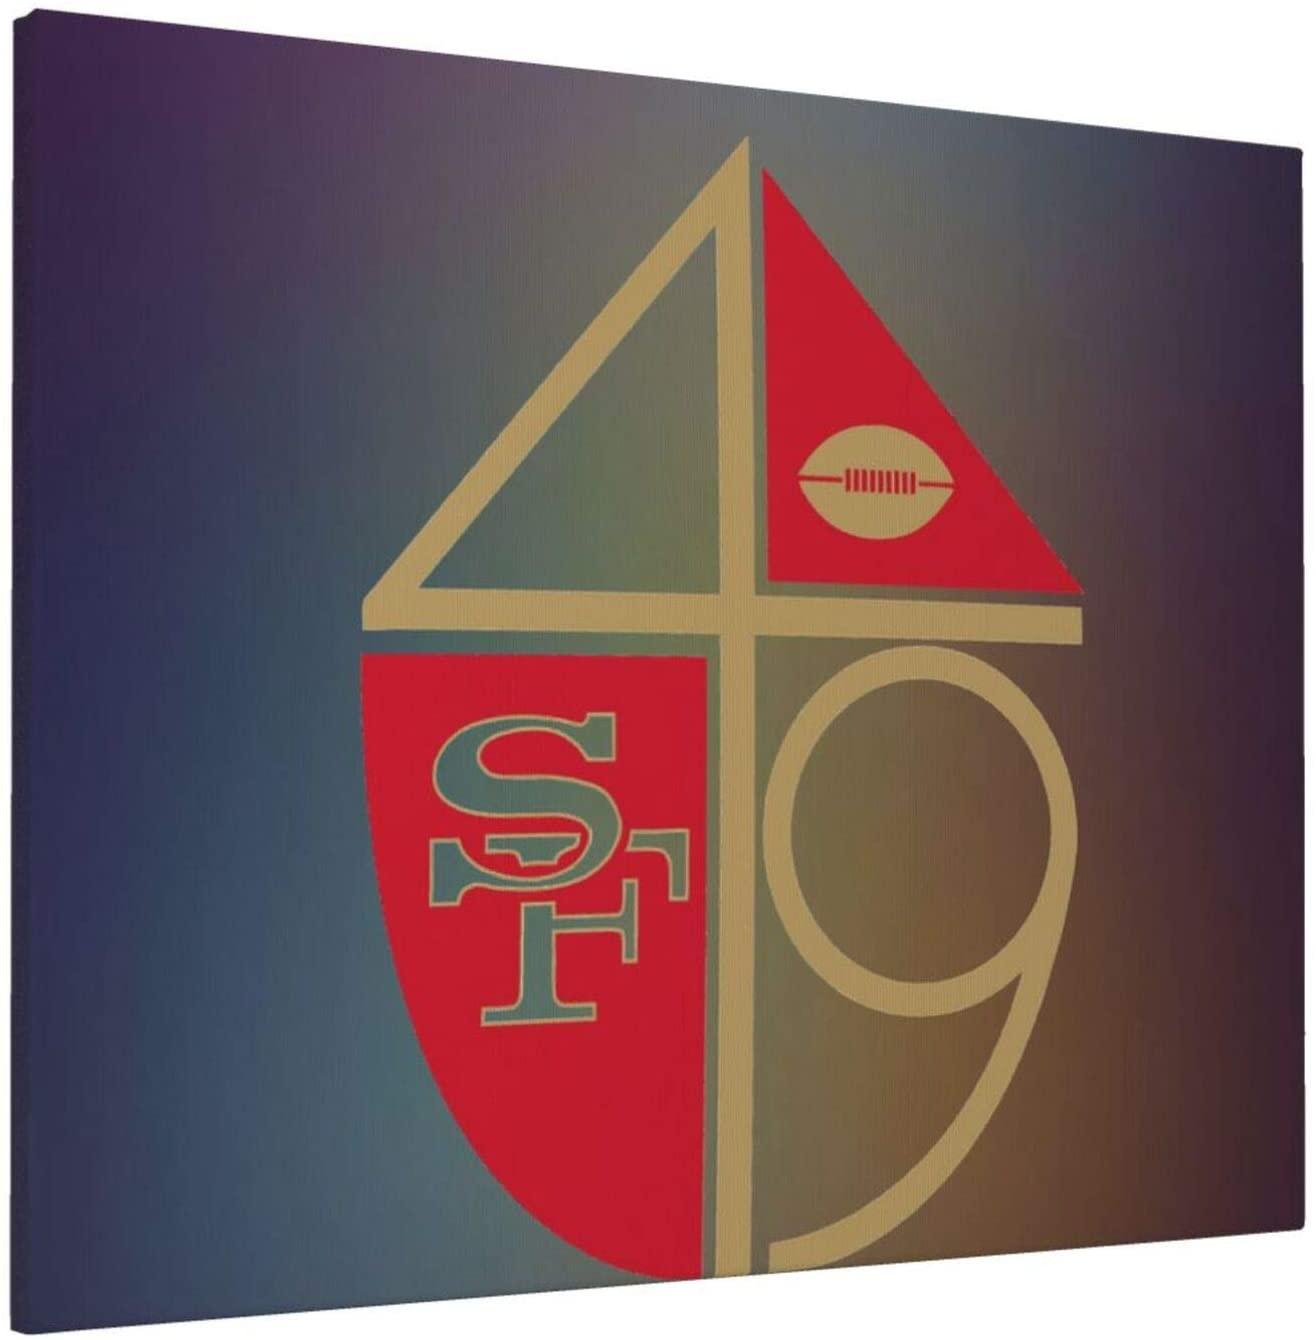 Ffashionshirt S-an Fr-ANC-ISCO 49e-Rs Hliving Room Bathroom Kitchen Art Frameless Painting 16x20inch